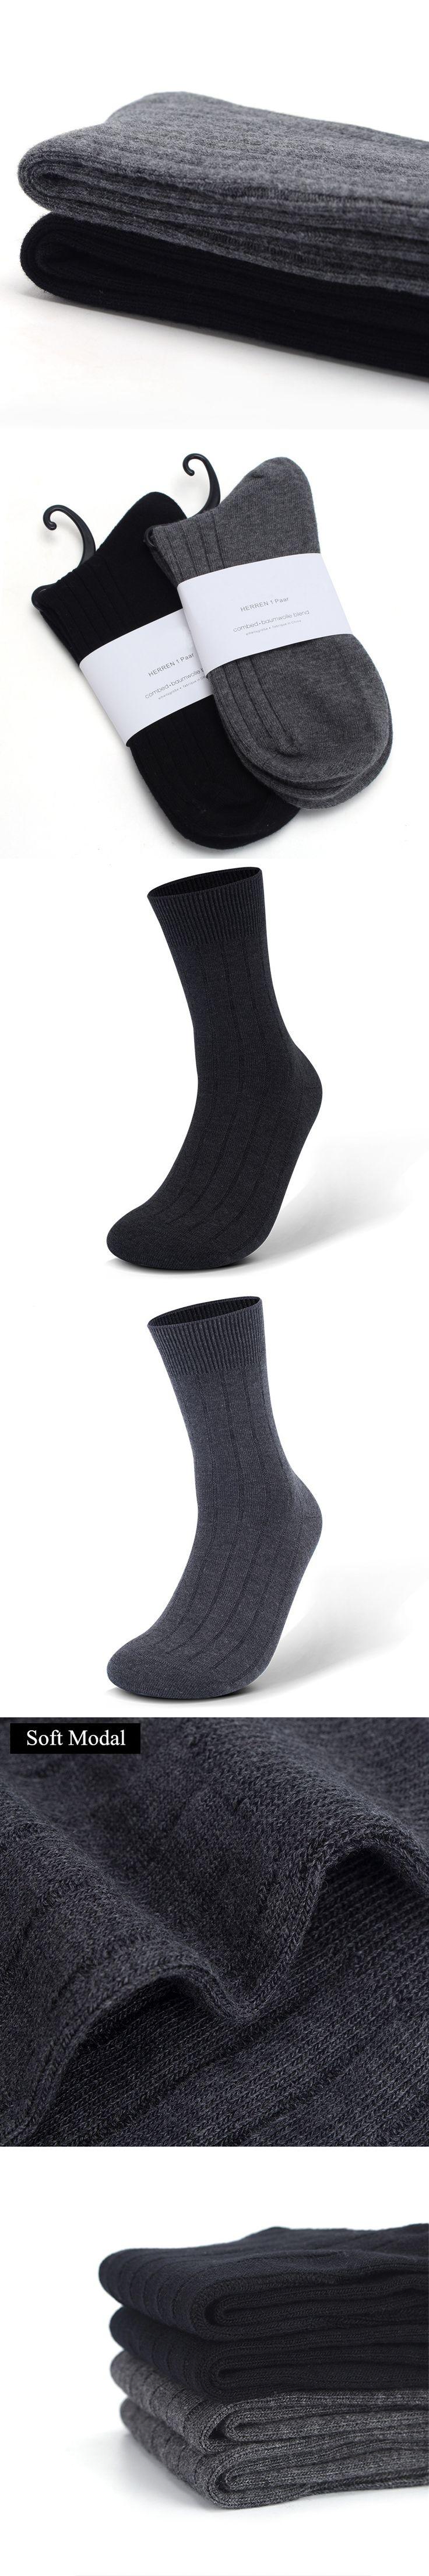 Fashion Mens Business Dress Socks Black Gray High Quality Breathable Deodorant Male Soft Crew Solid Modal Socks Sox US Size 7-11